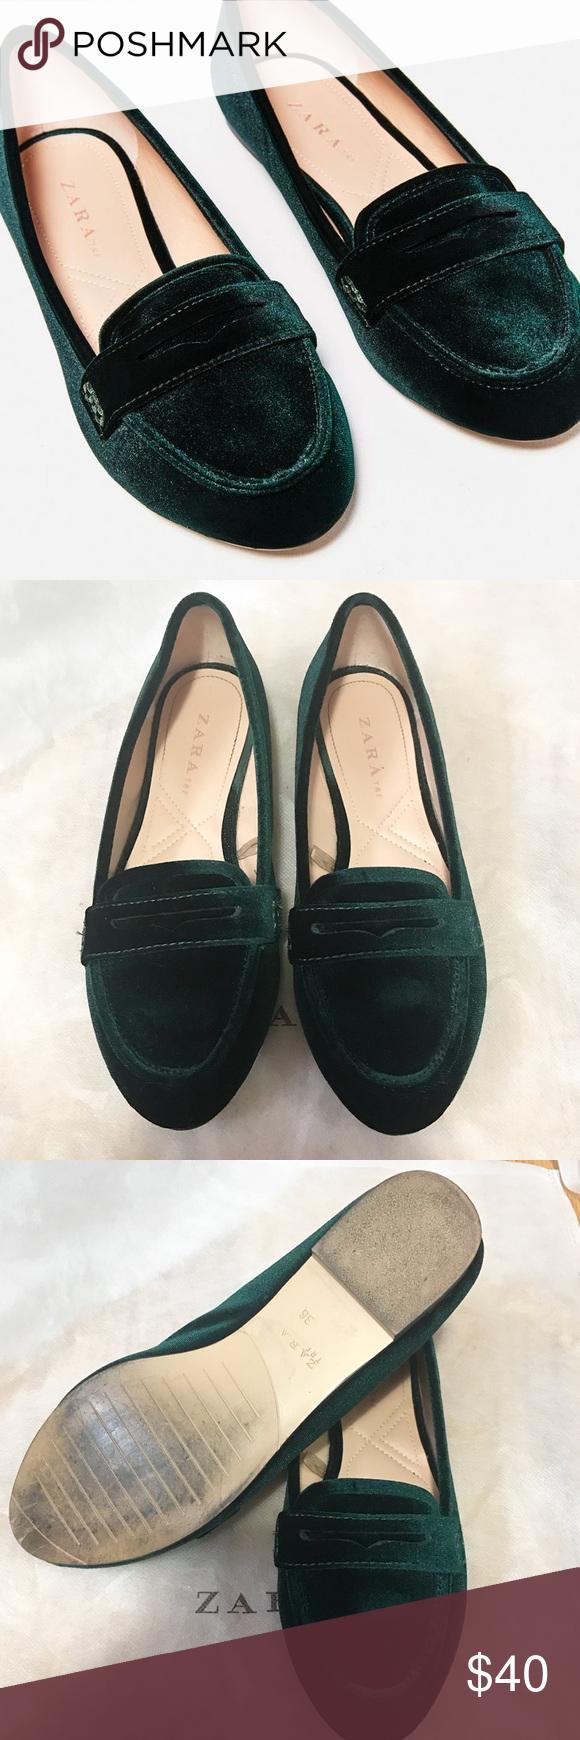 5f72e4e3da2 Zara green velvet loafers Used twice great condition. Zara Shoes Flats    Loafers